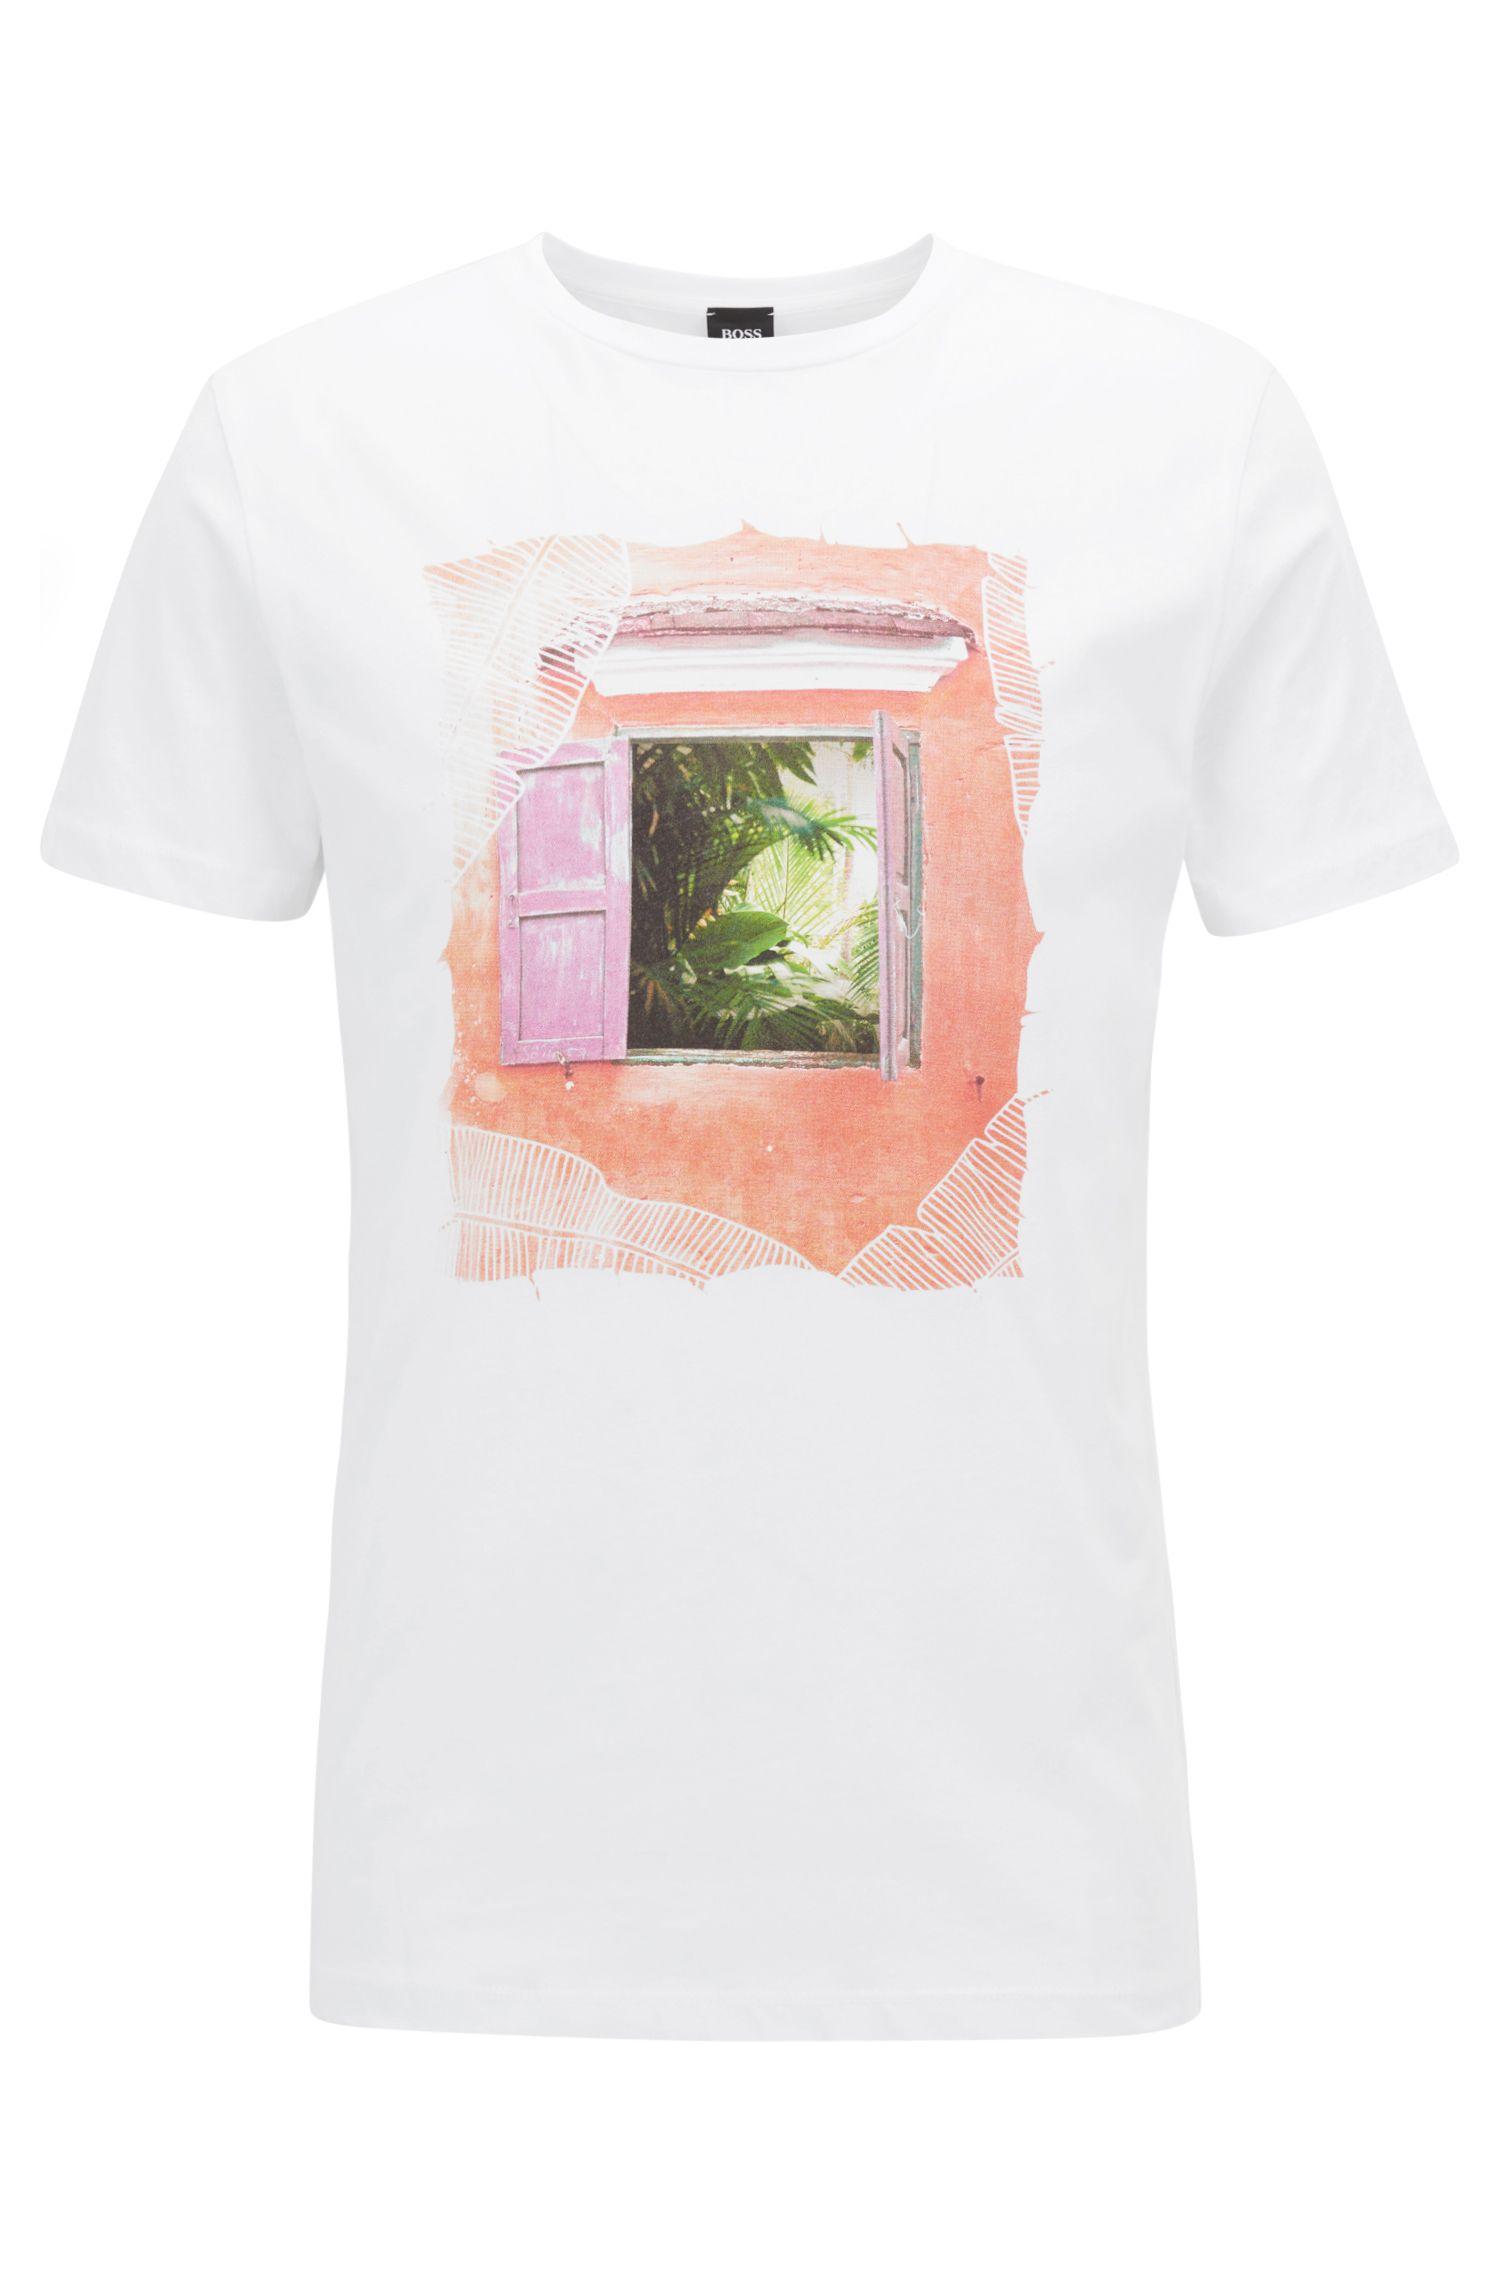 Cuba-Print Cotton Jersey Graphic T-Shirt   Tauno